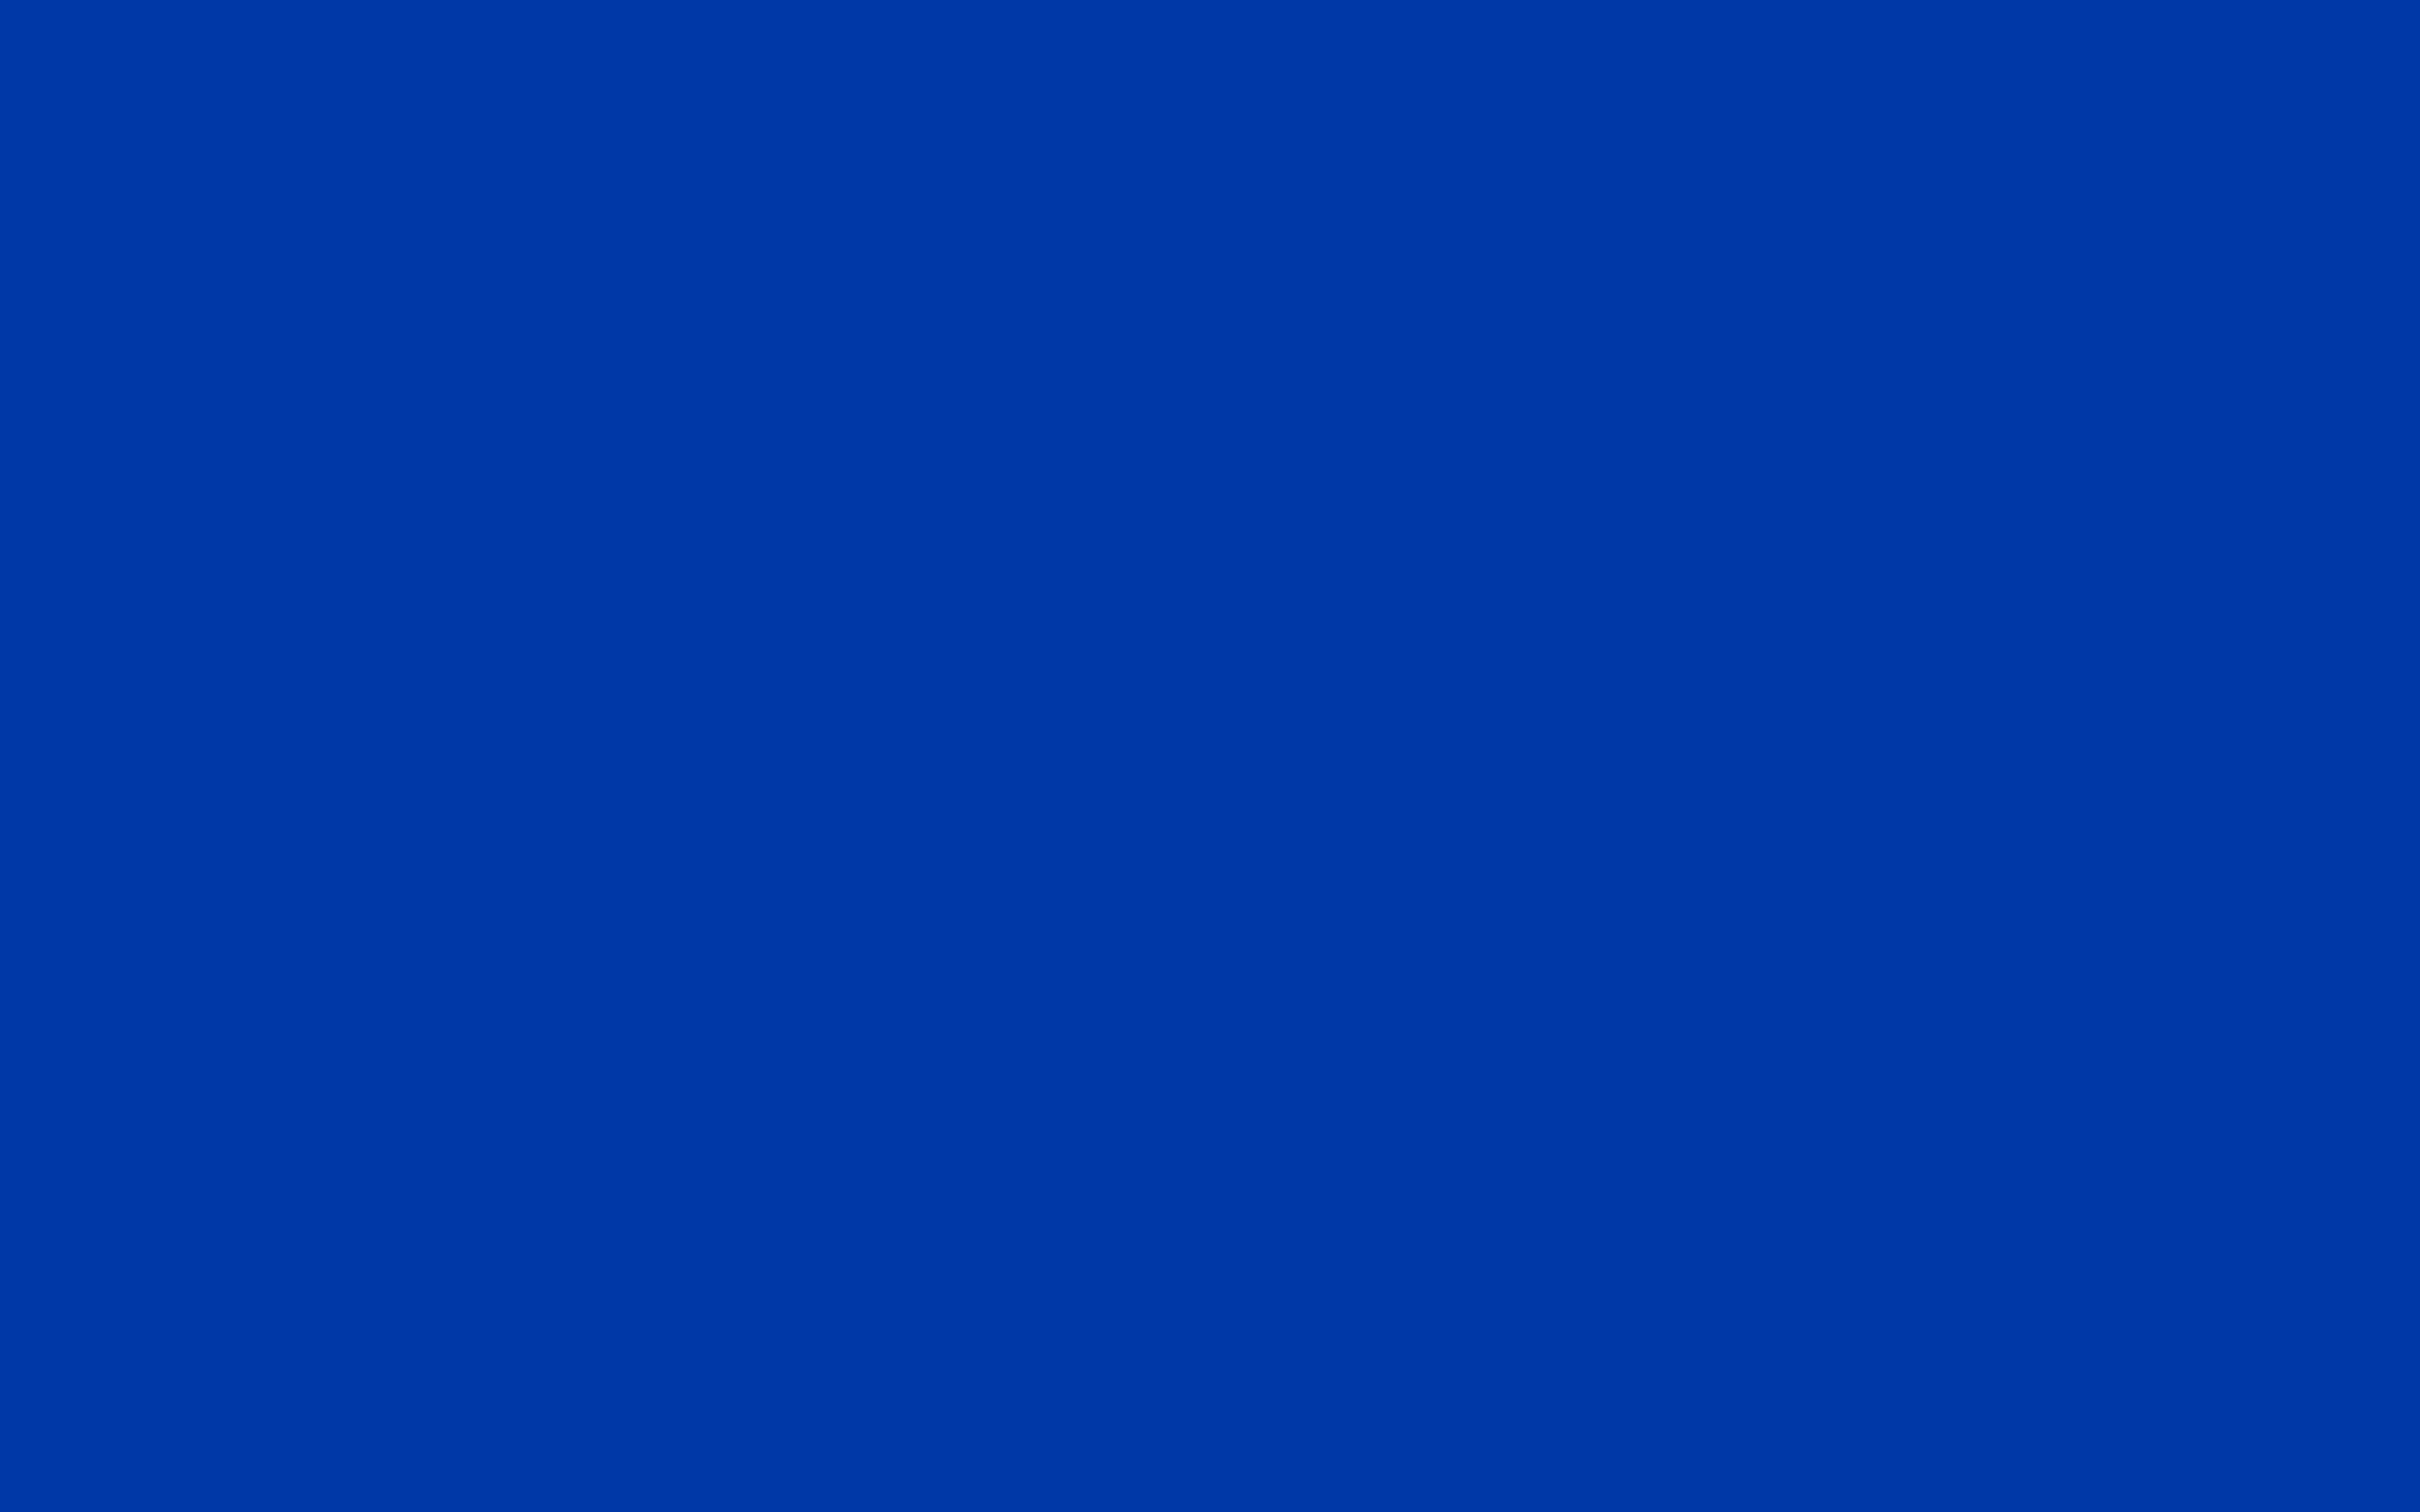 2560x1600 Royal Azure Solid Color Background